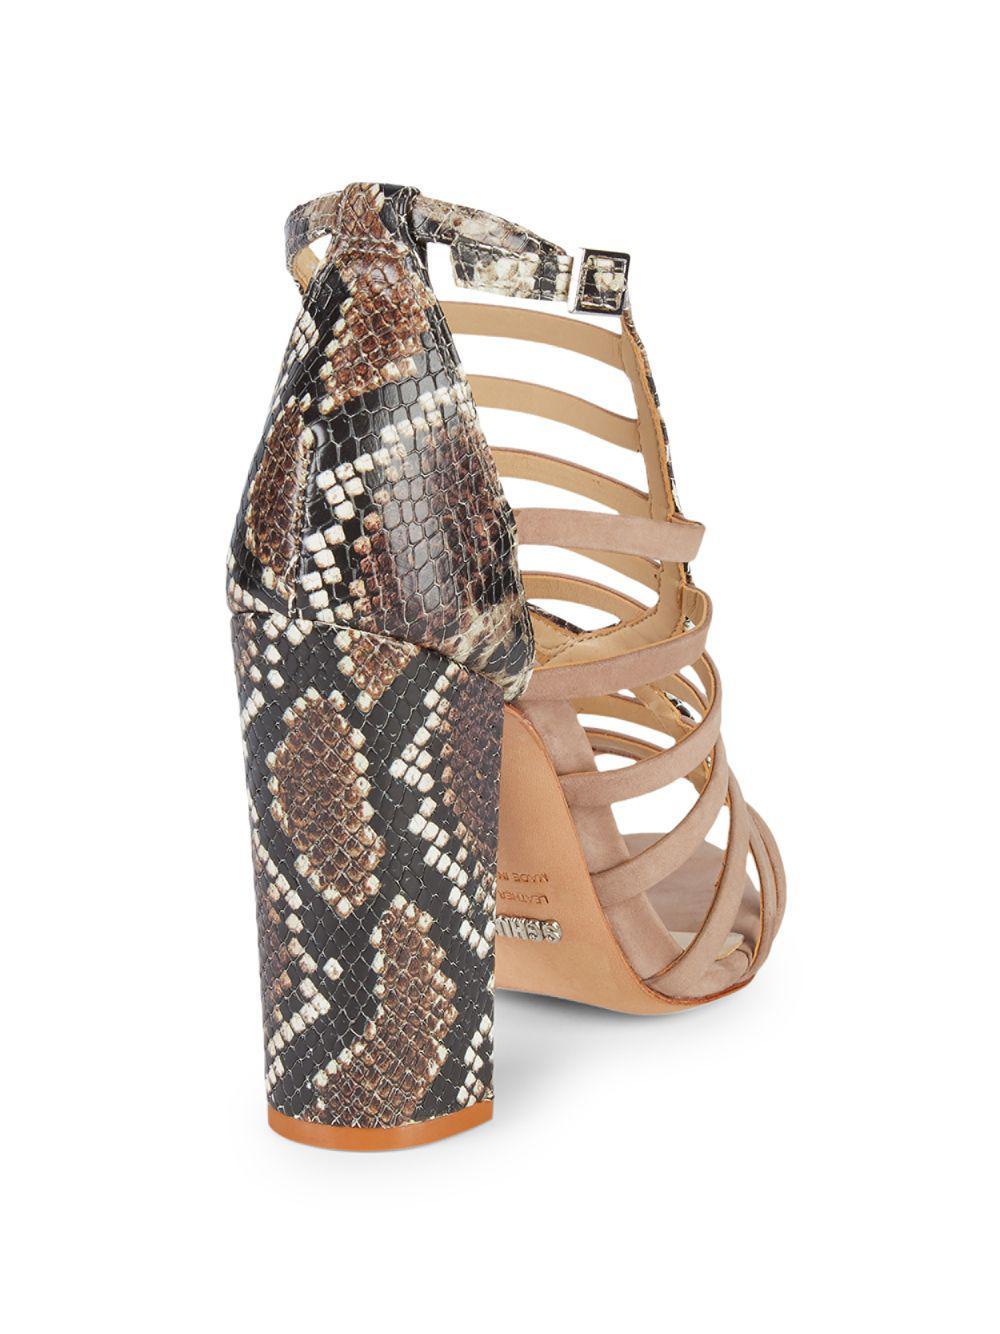 89c3717282a88 Lyst - Schutz Kaye Snake-skin Print Embossed Leather Block Heel Sandals